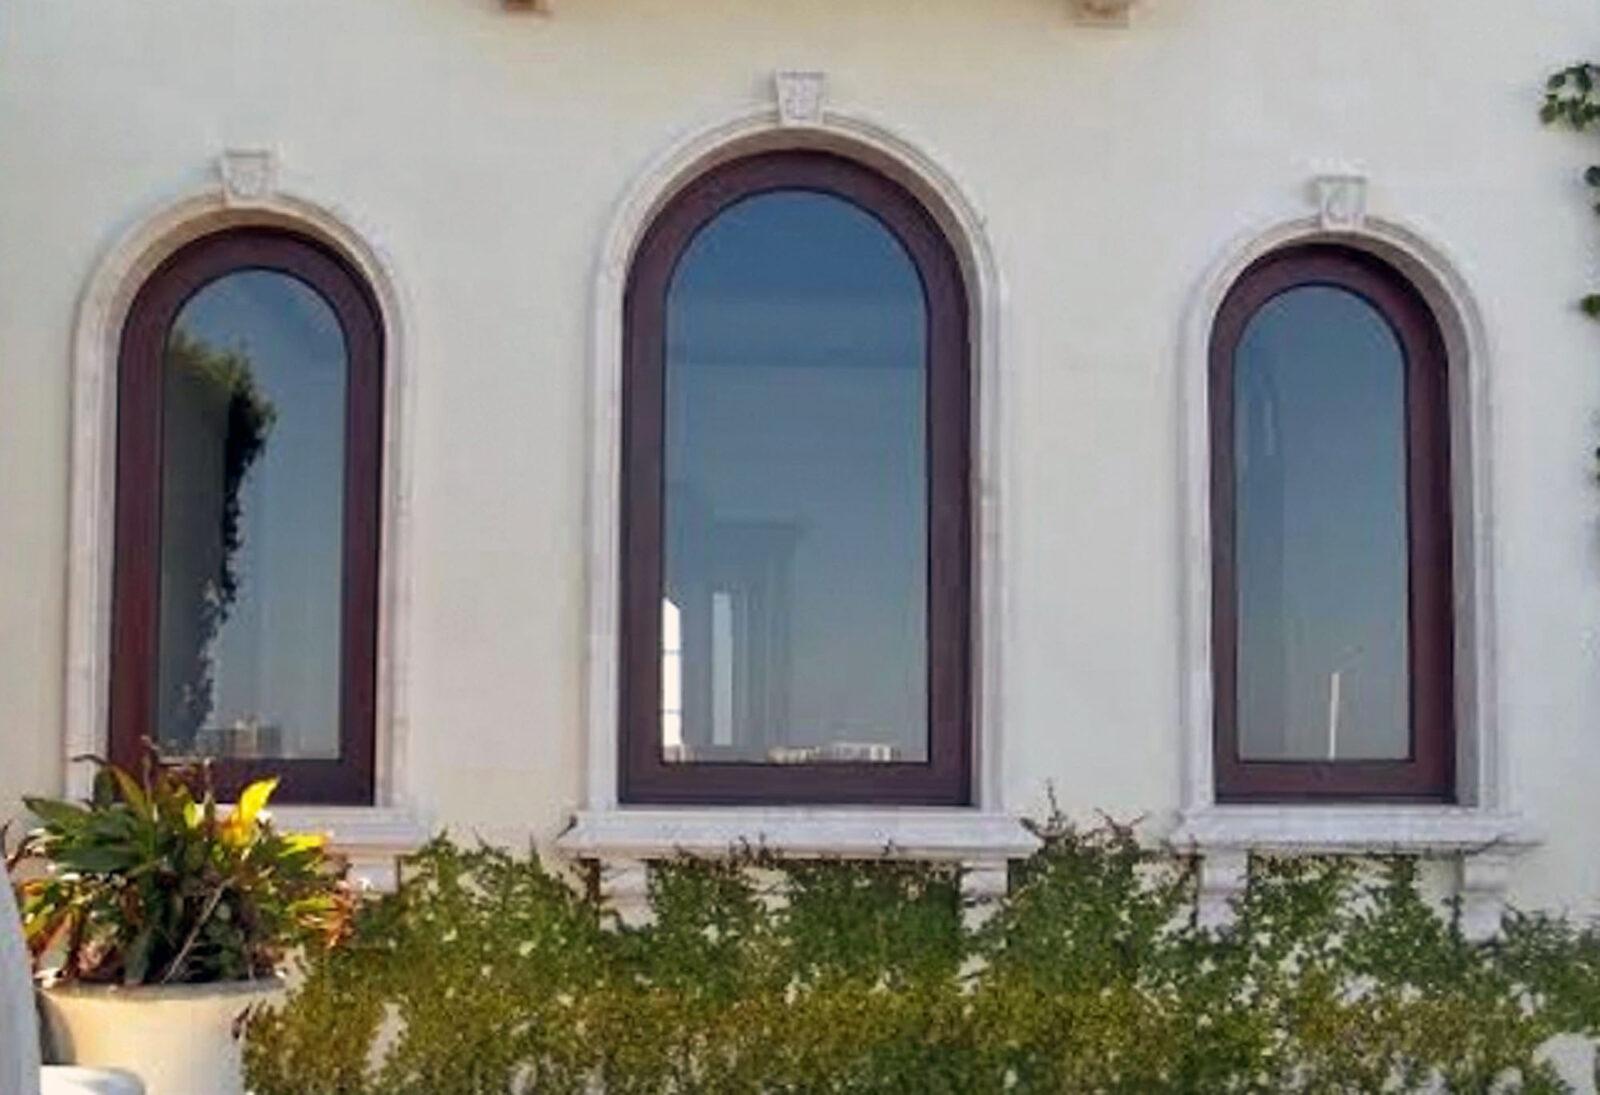 SOUTH MIAMI BEACH WINDOWS